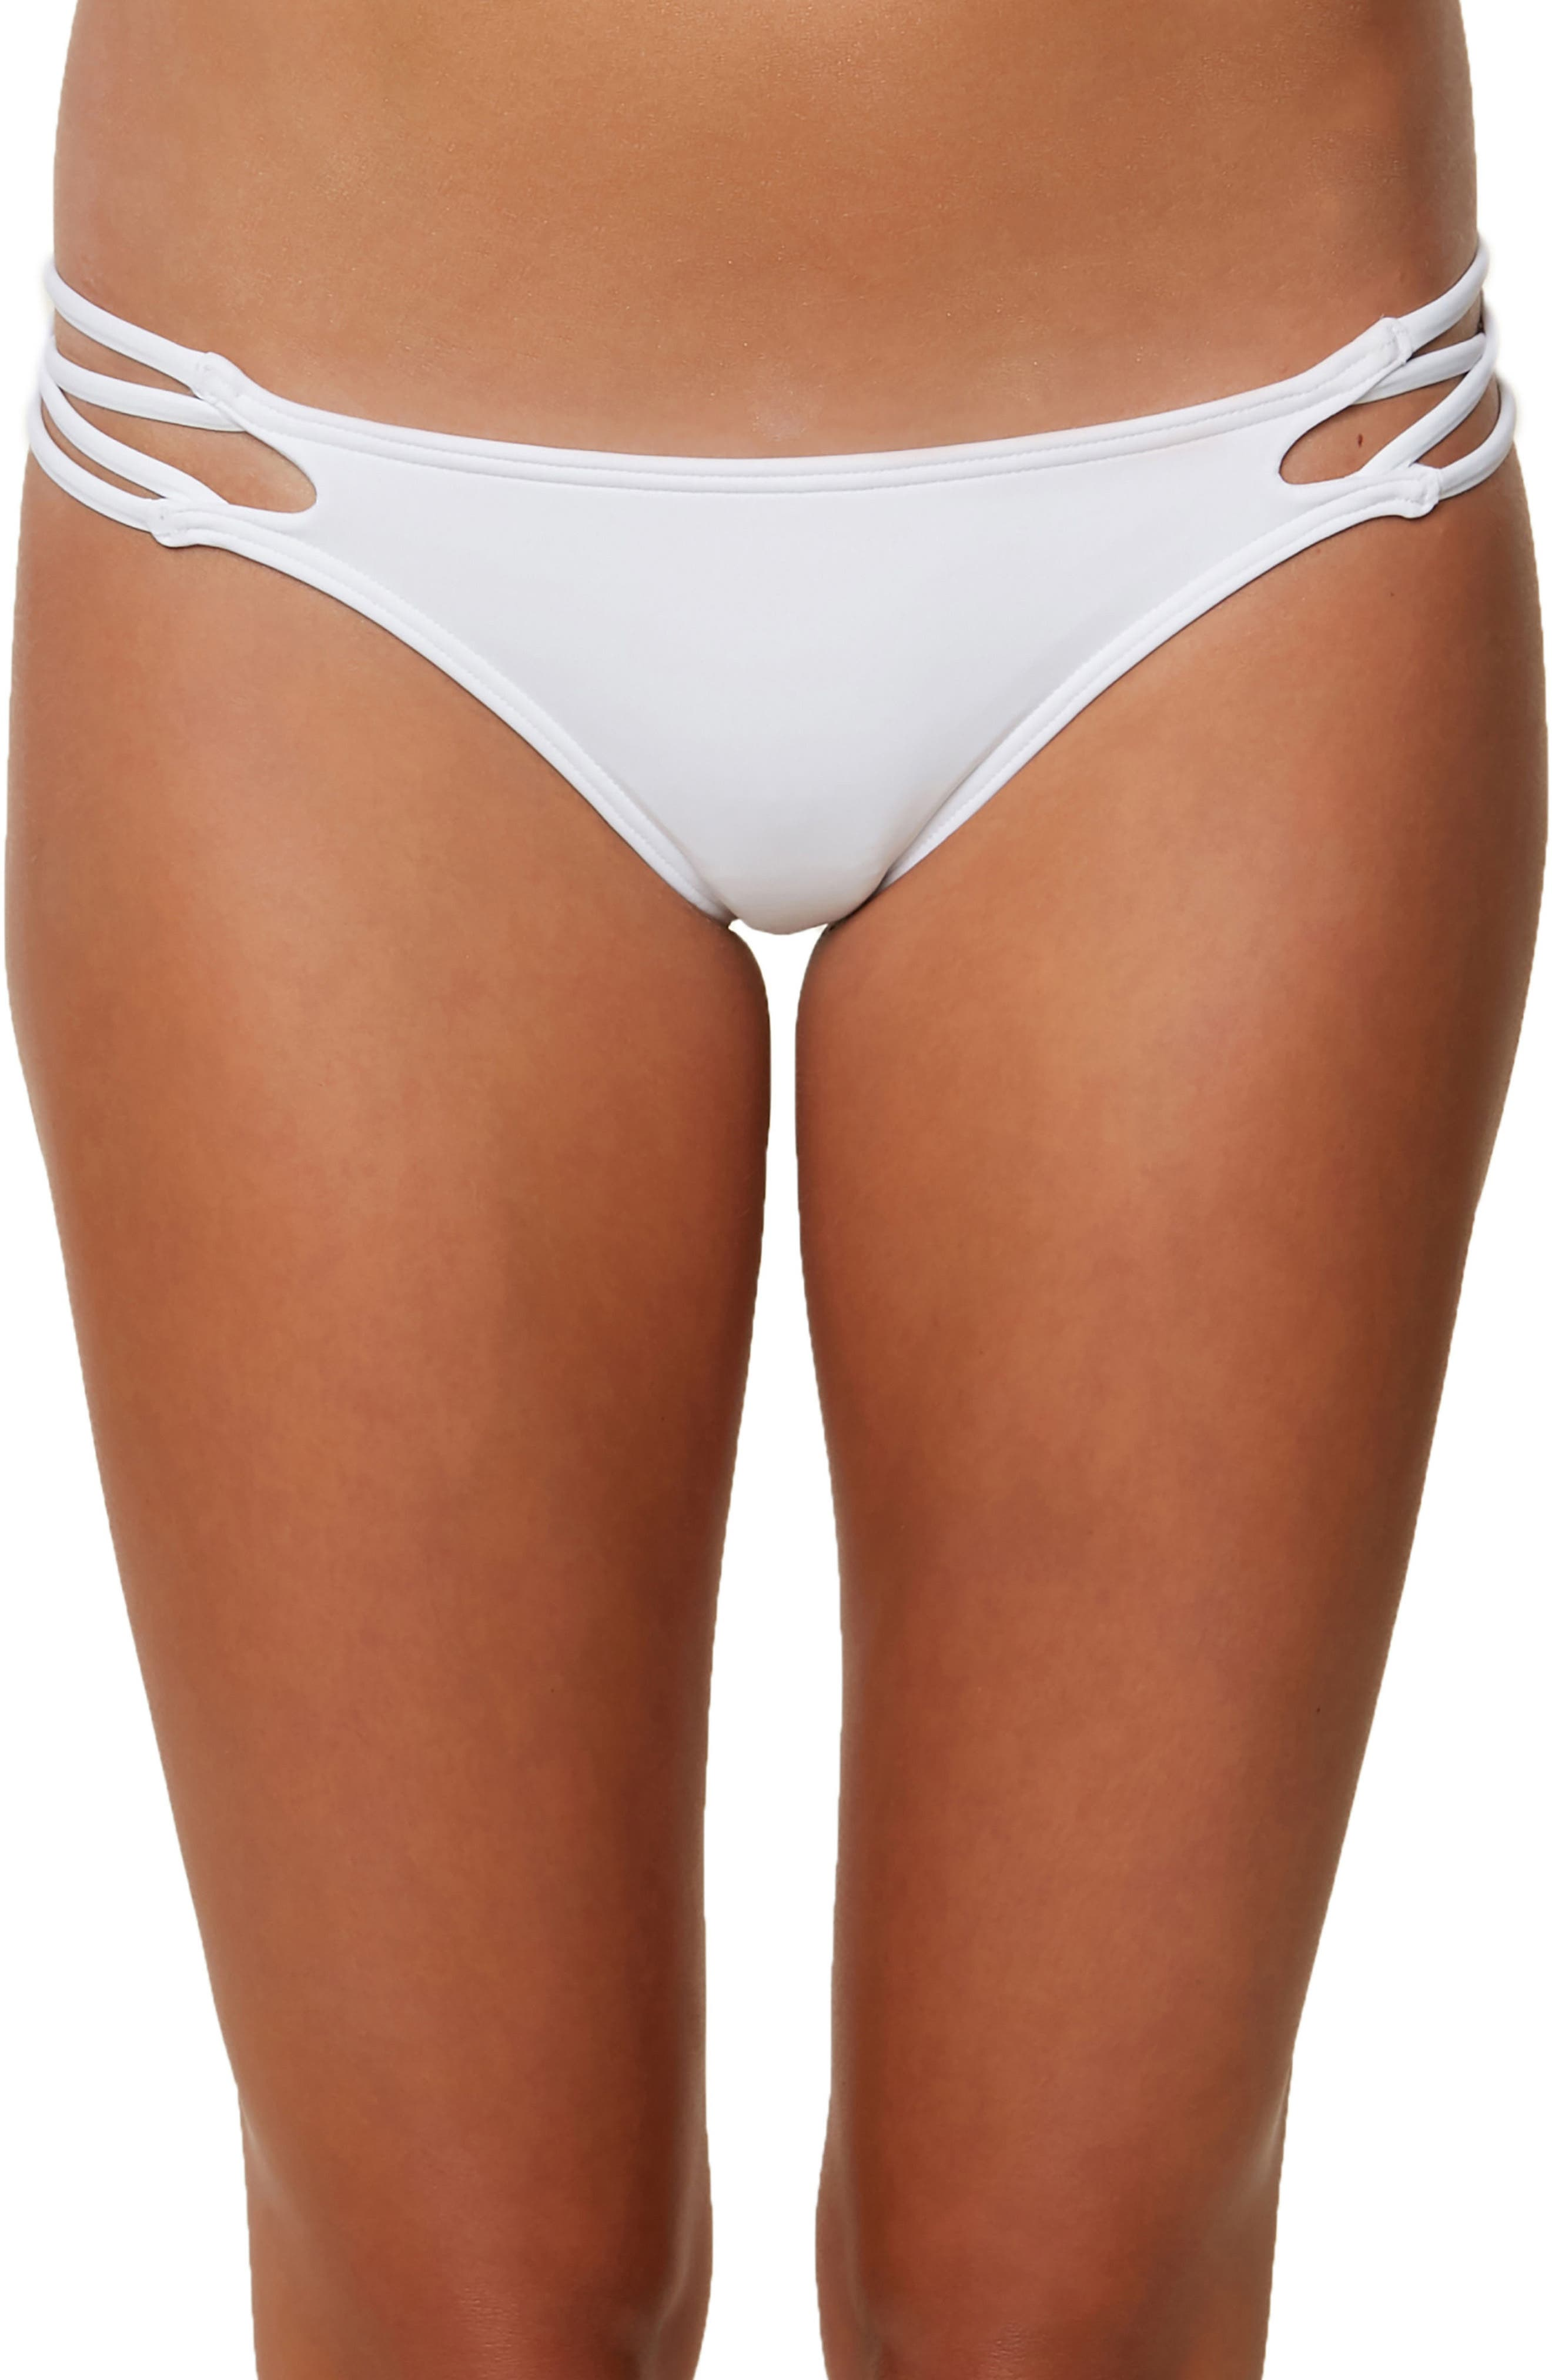 Salt Water Crisscross Bikini Bottoms,                         Main,                         color, 100